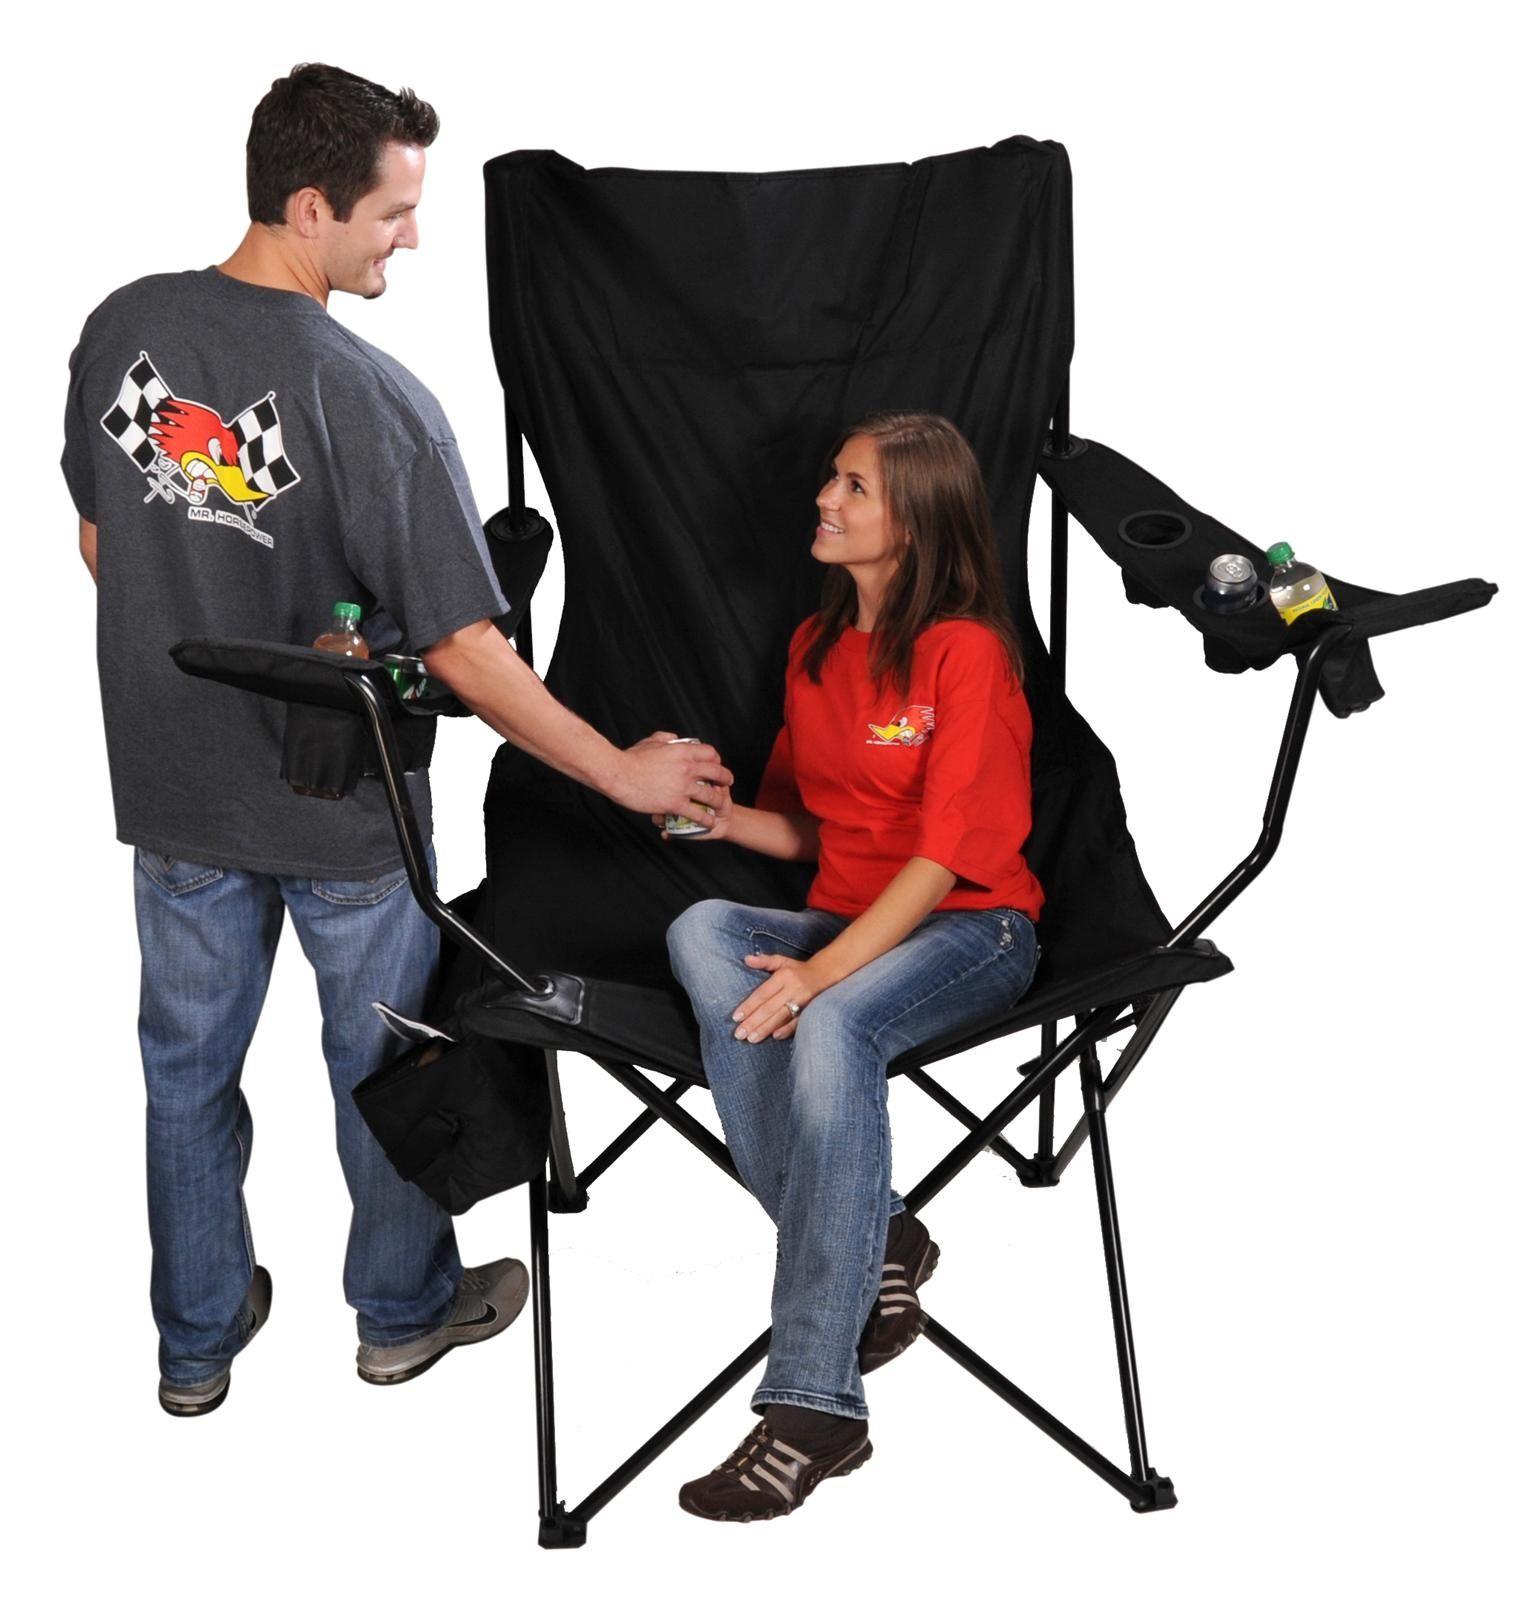 giant folding chair tennis ball feet on the edge kingpin http jeremyeatonart com